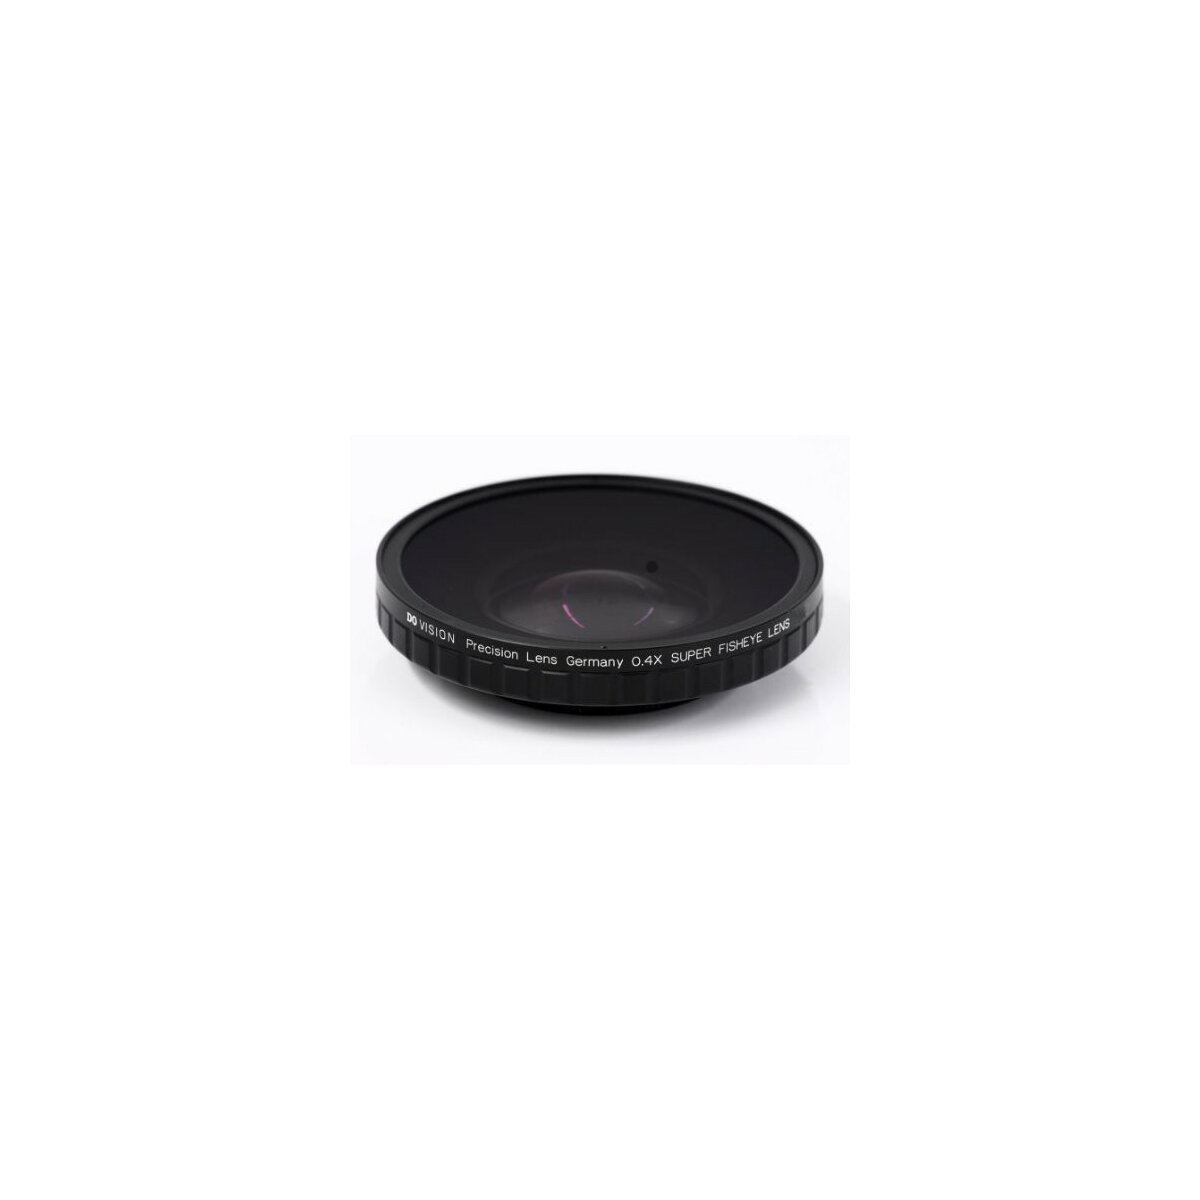 0.4x HD Fisheye 62mm Profi Broadcastlinse